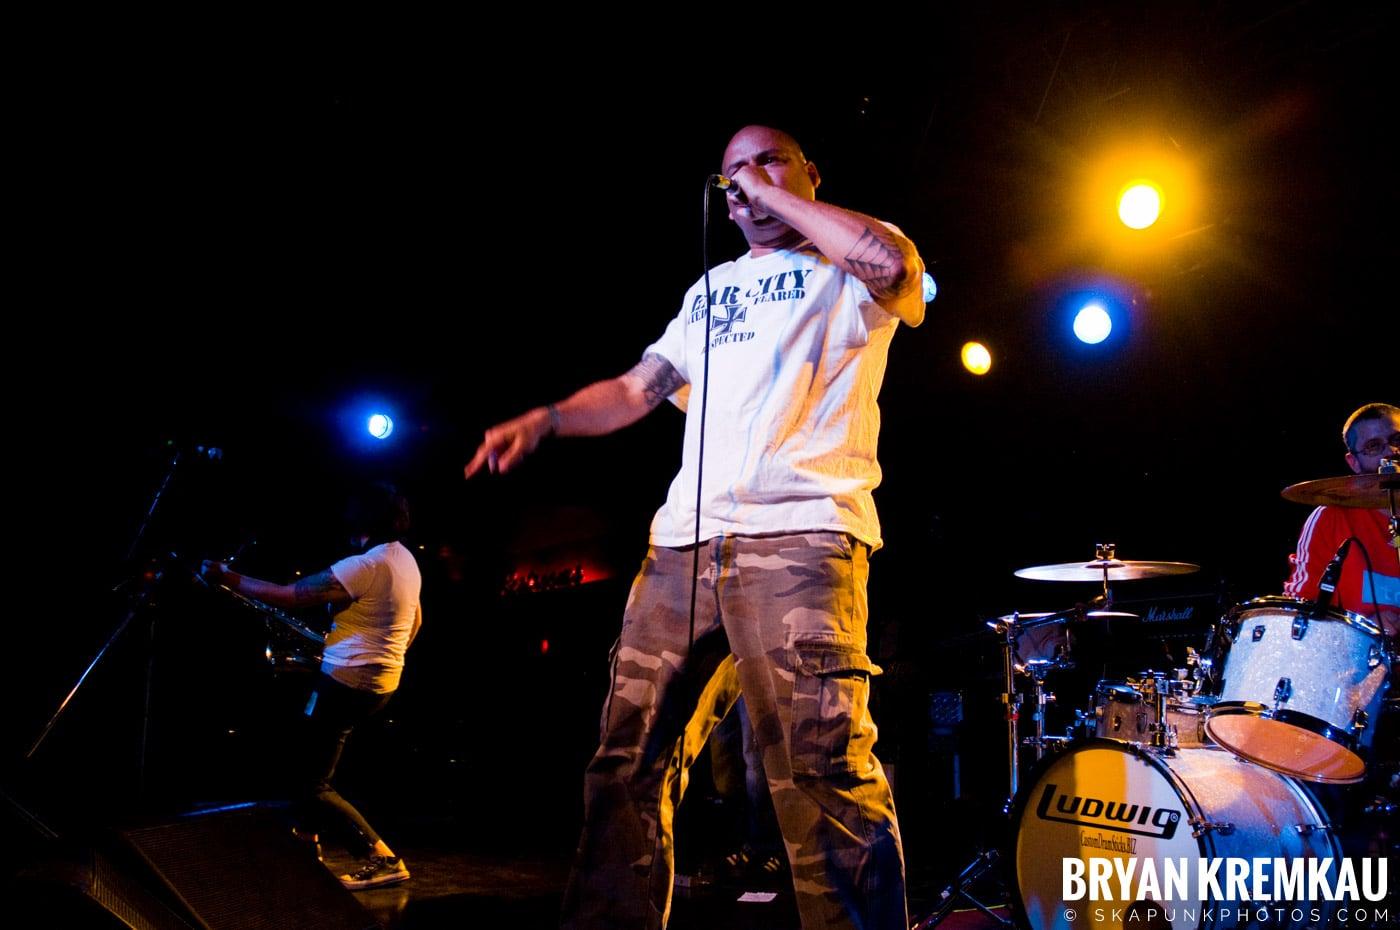 Hub City Stompers (Ska is Dead Tour) @ Starland Ballroom, Sayreville, NJ - 11.15.09 (15)